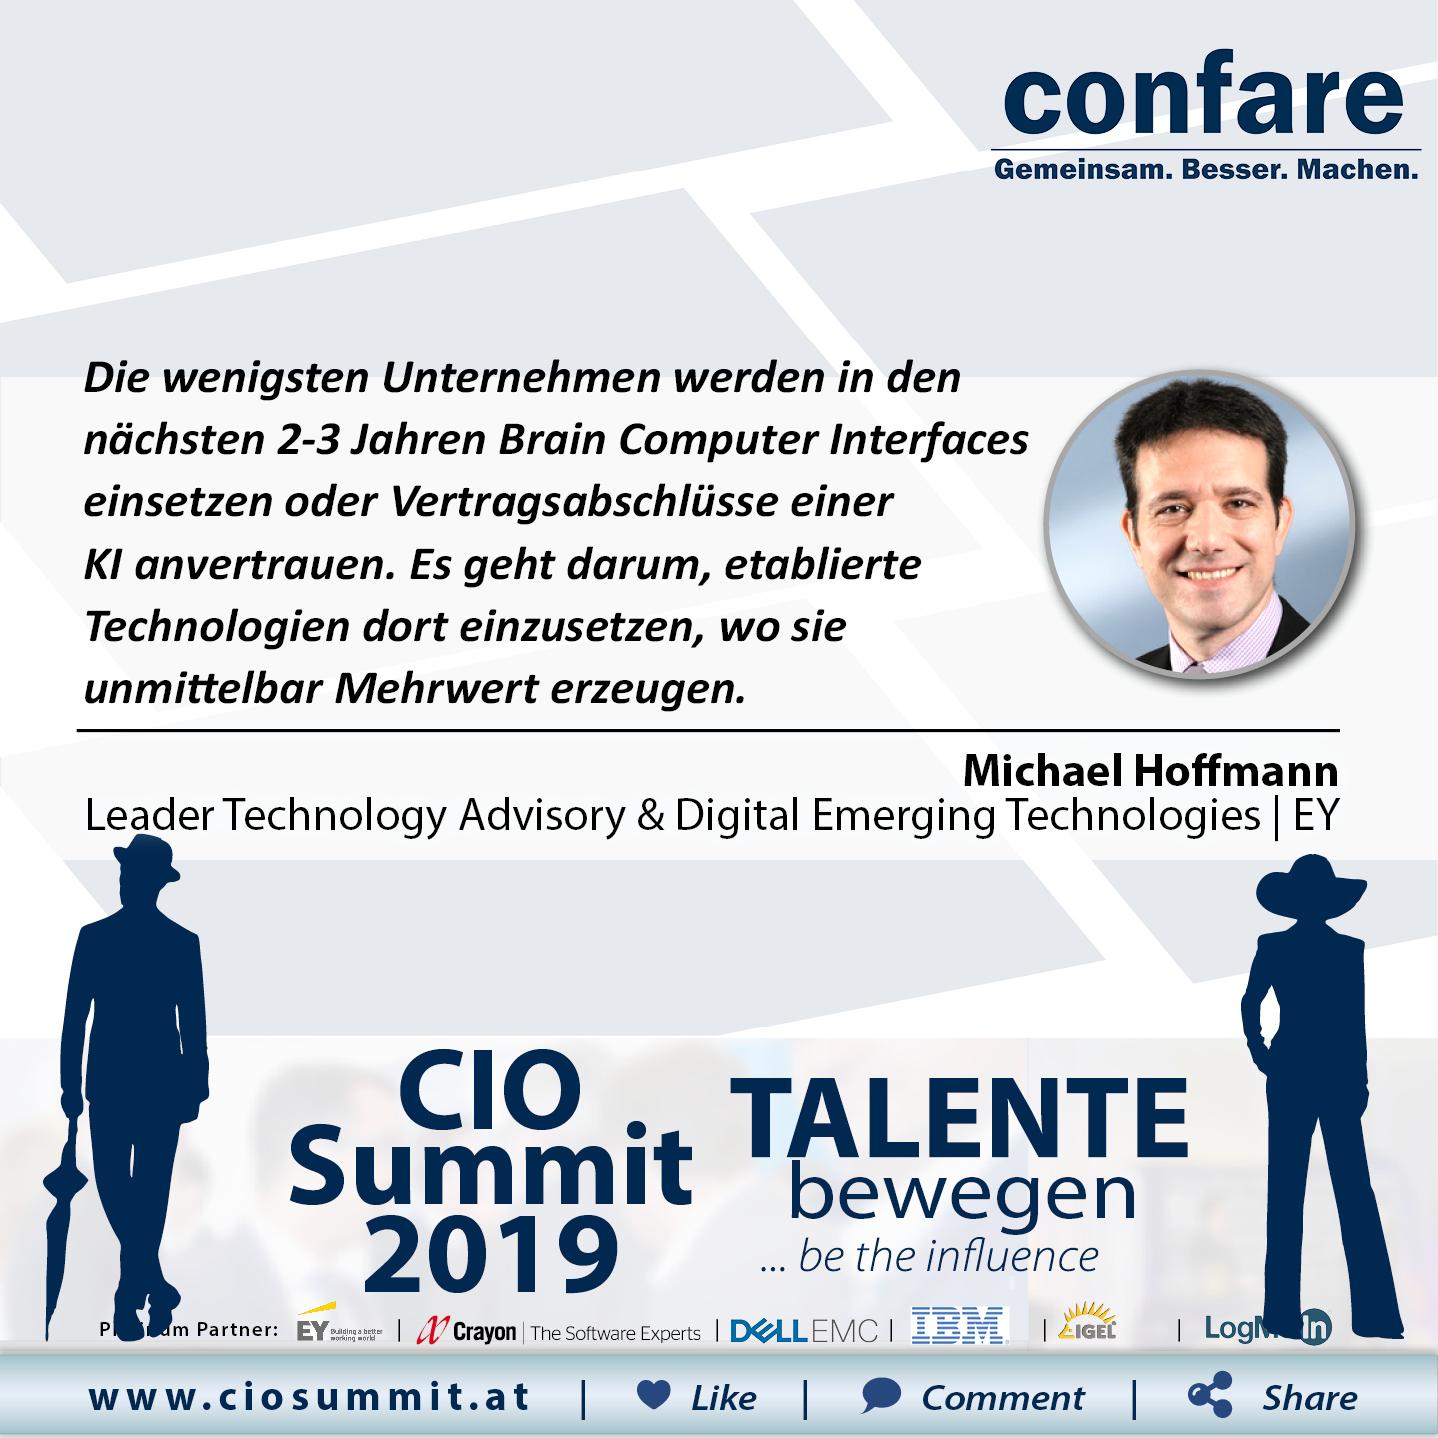 Meme CIO Summit 2019 - Michael Hoffmann